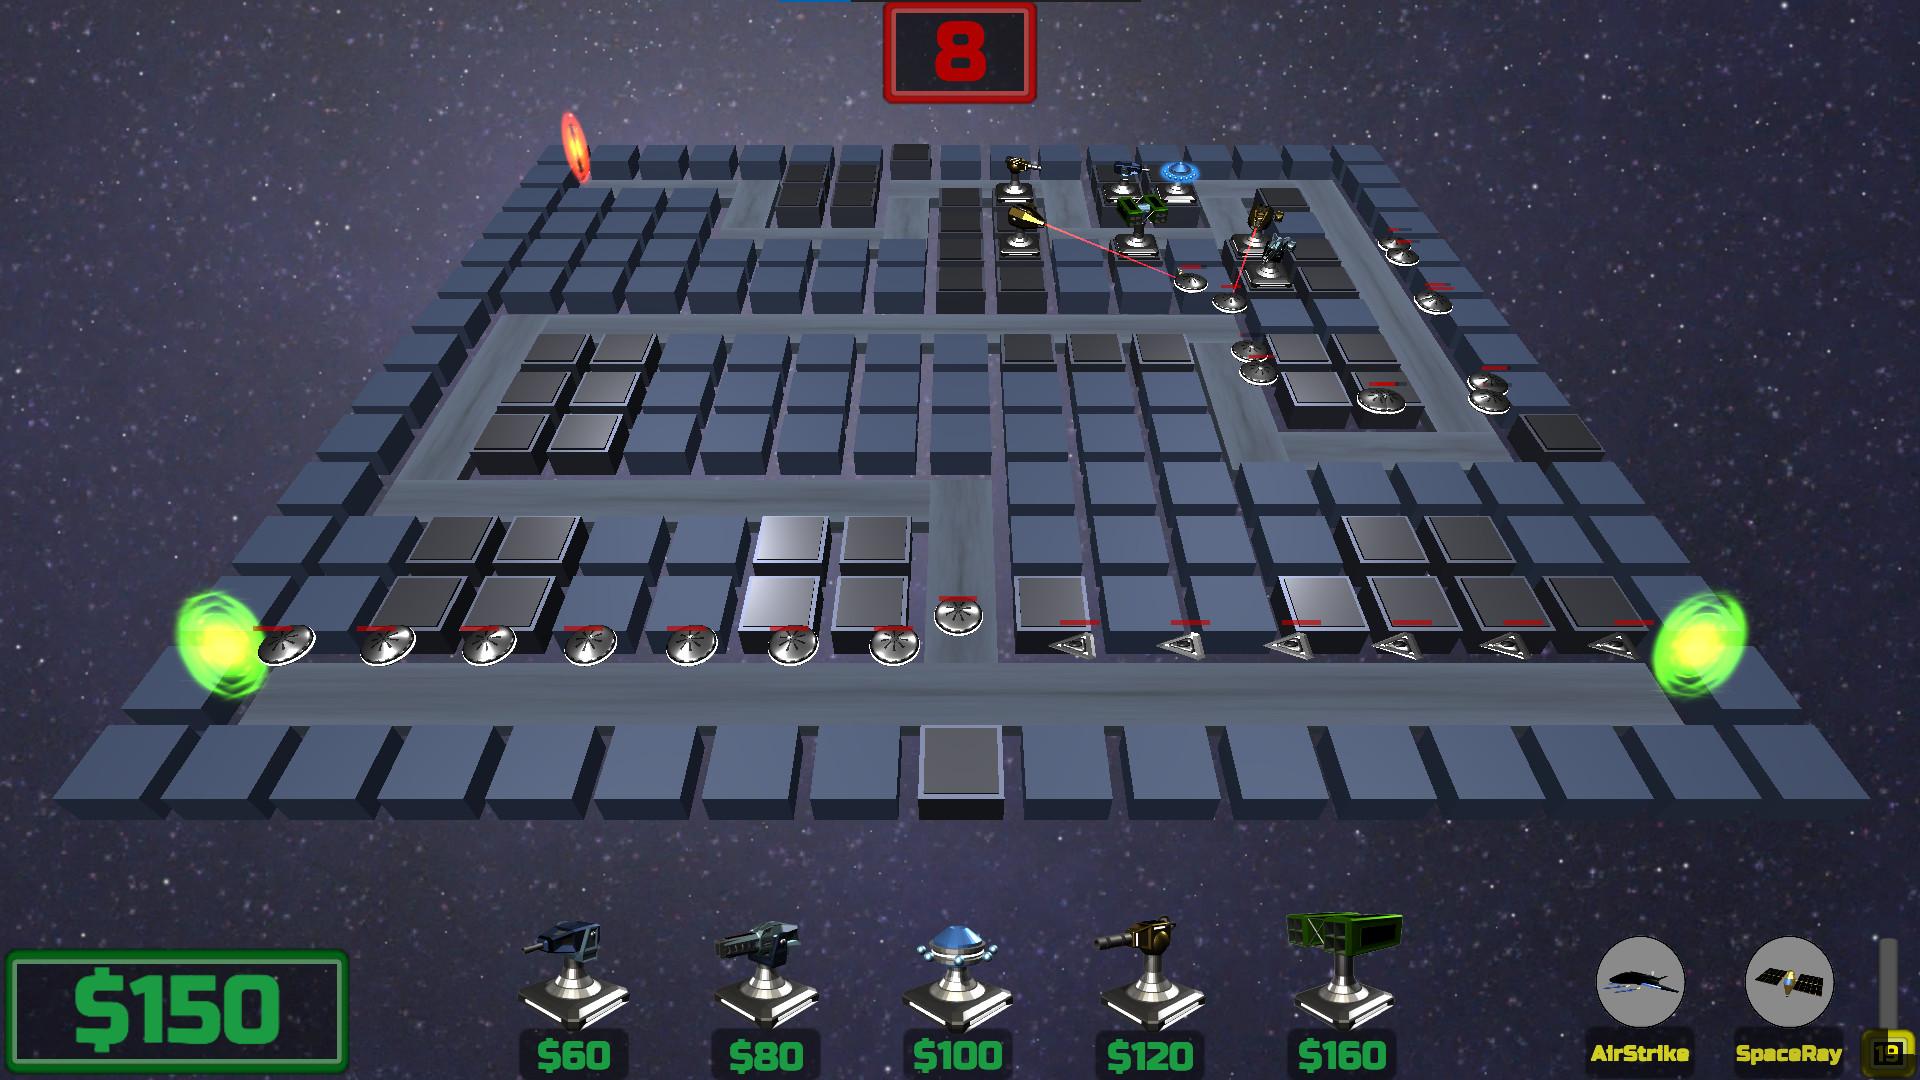 U.F.O. K.O. Tower Defense Free Download